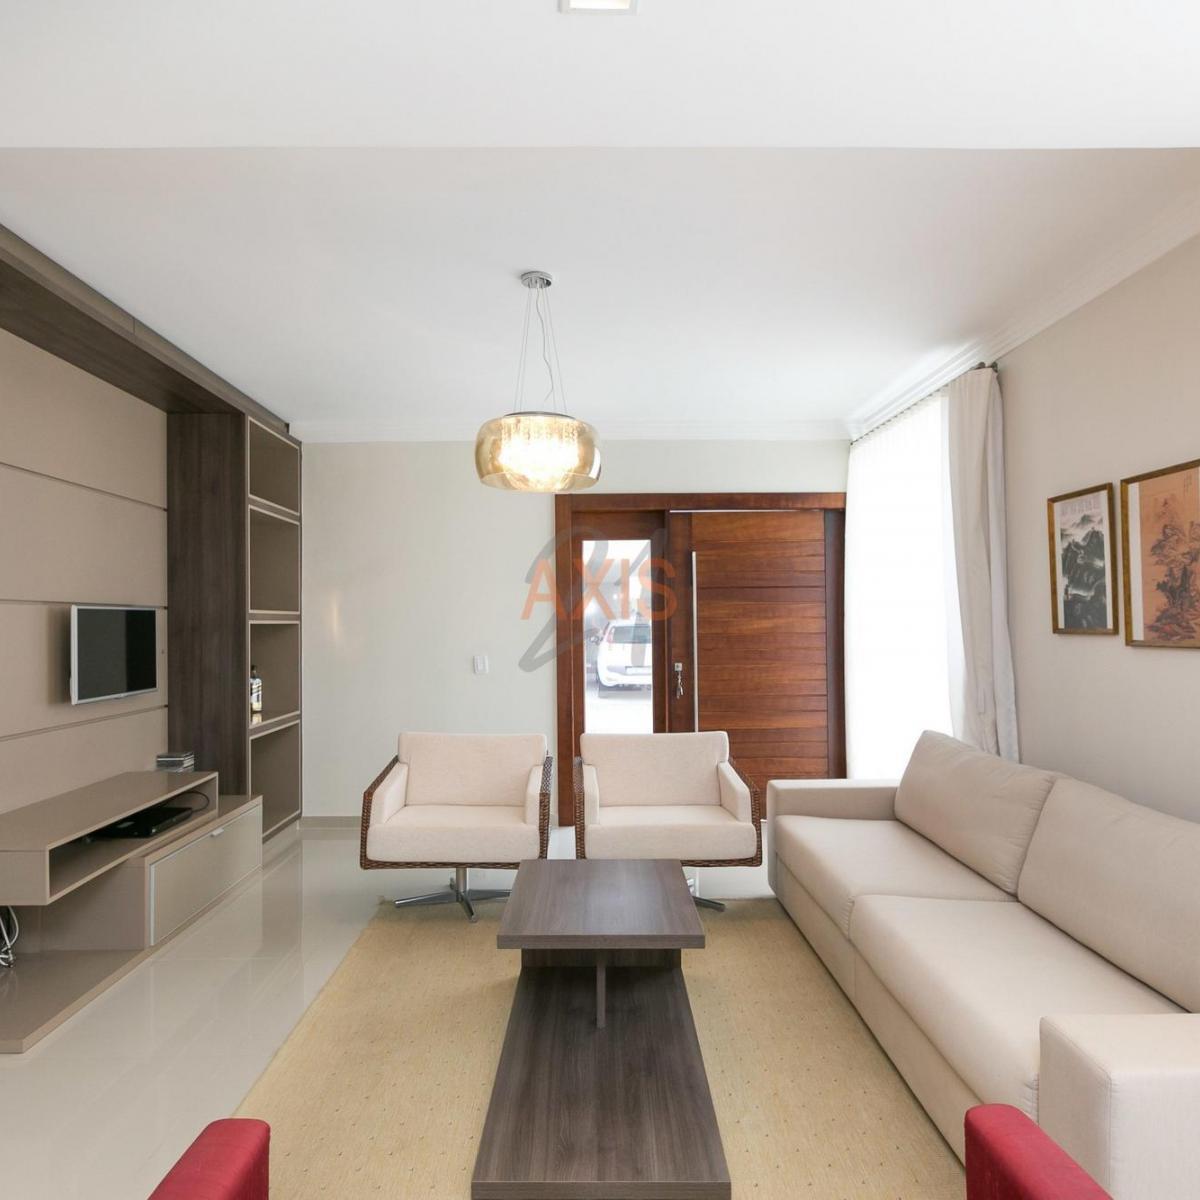 http://www.infocenterhost2.com.br/crm/fotosimovel/433747/103132811-casa-em-condominio-curitiba-santo-inacio_marcadagua.jpg